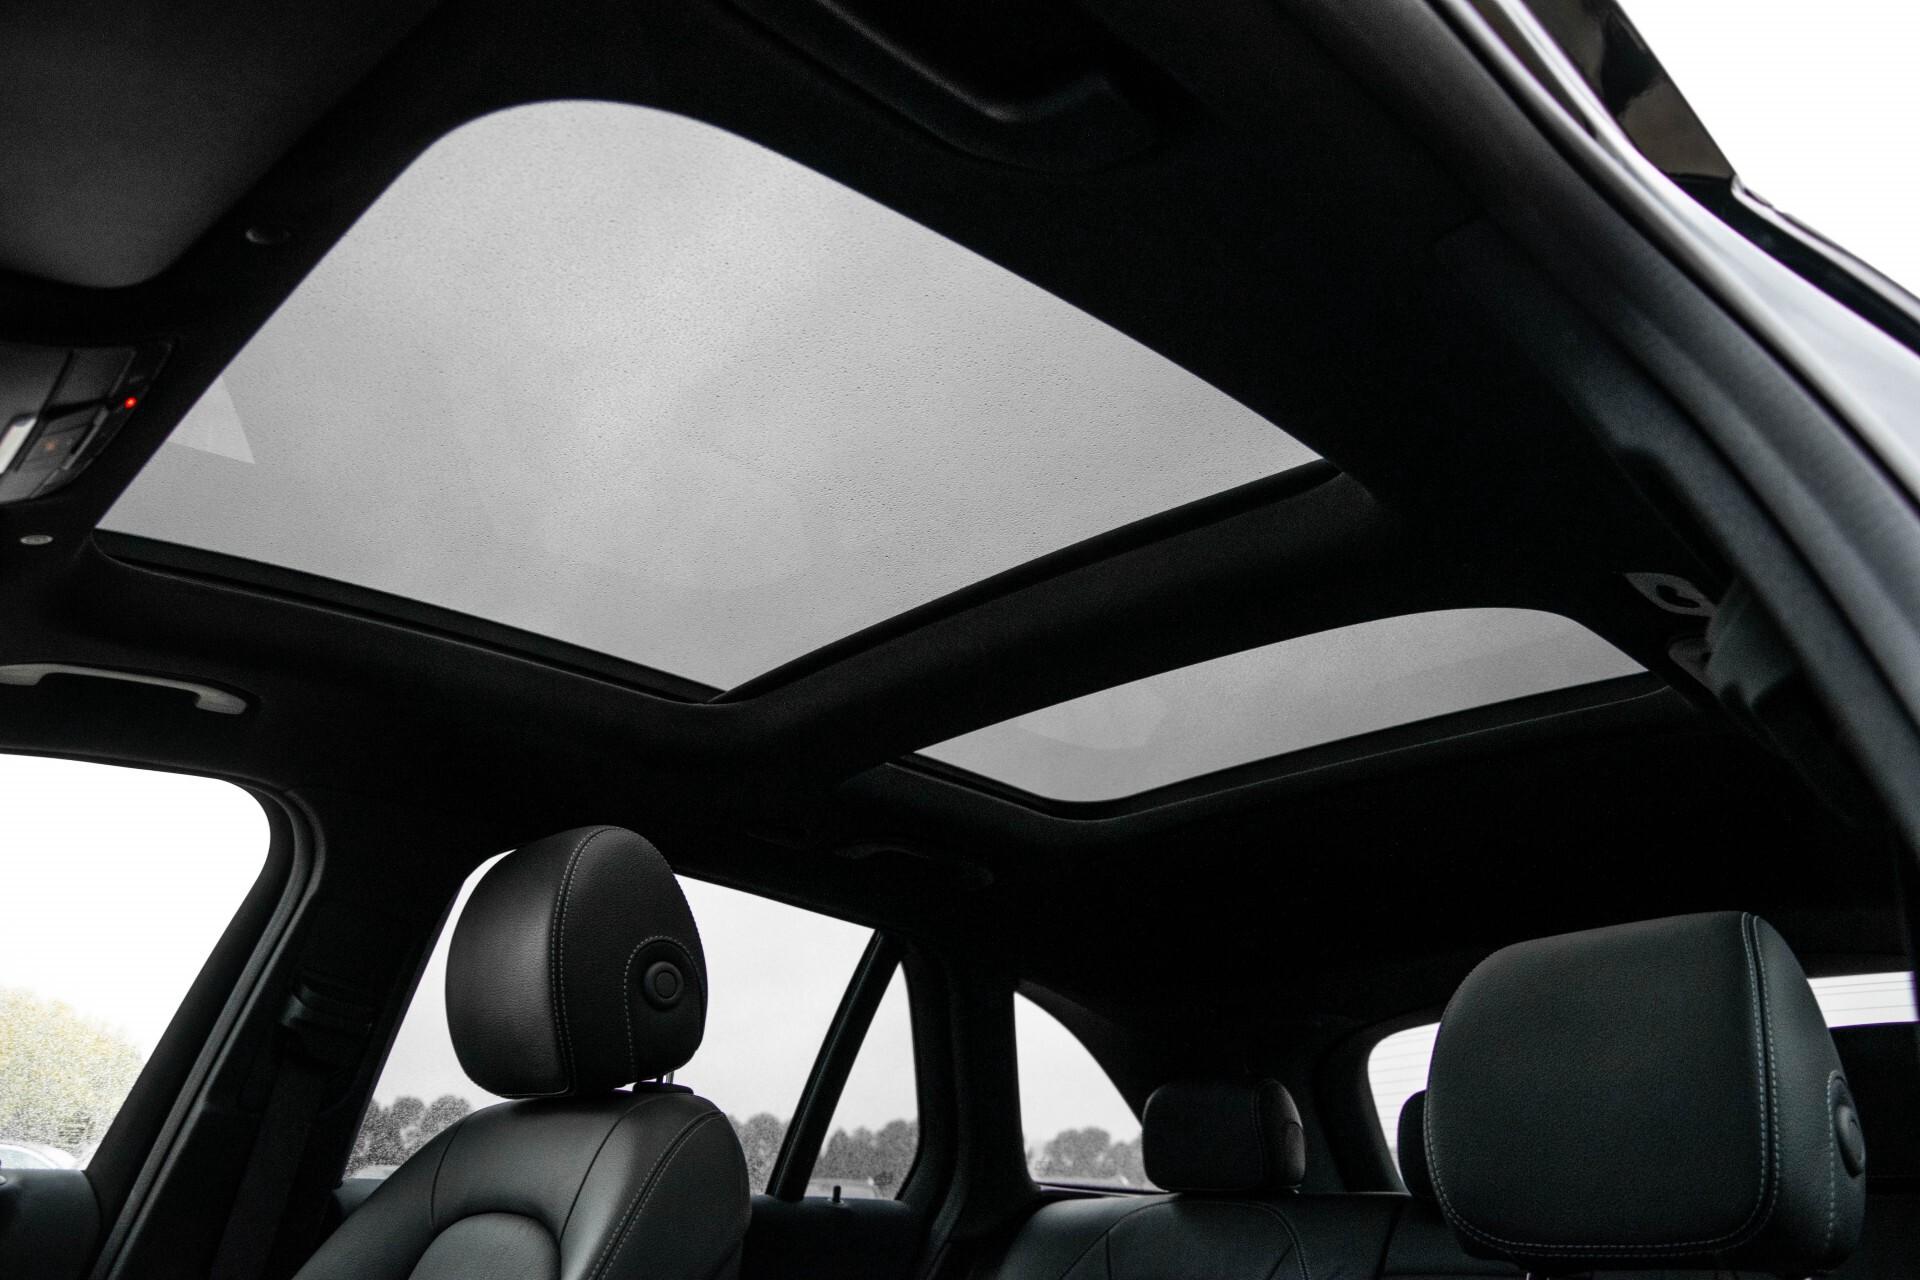 Mercedes-Benz GLC 200 4-M AMG Night/Panorama/Distronic Pro/Burmester/360camera/Exclusive Aut9 Foto 55